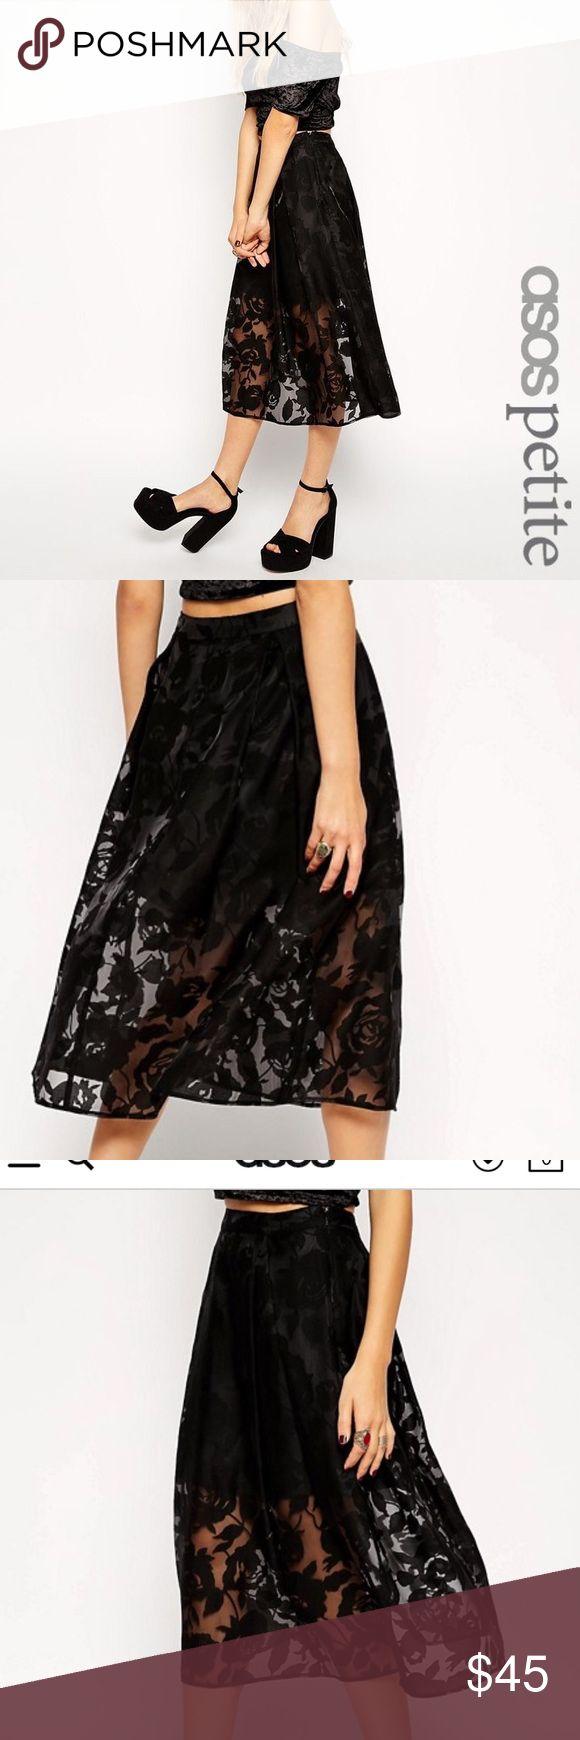 Just In‼️Asos Petite Skirt‼️ Beautiful Black Sheer Floral Organza Overlay Skirt. NWT. ‼️Bundle & Save‼️ ASOS Petite Skirts Midi